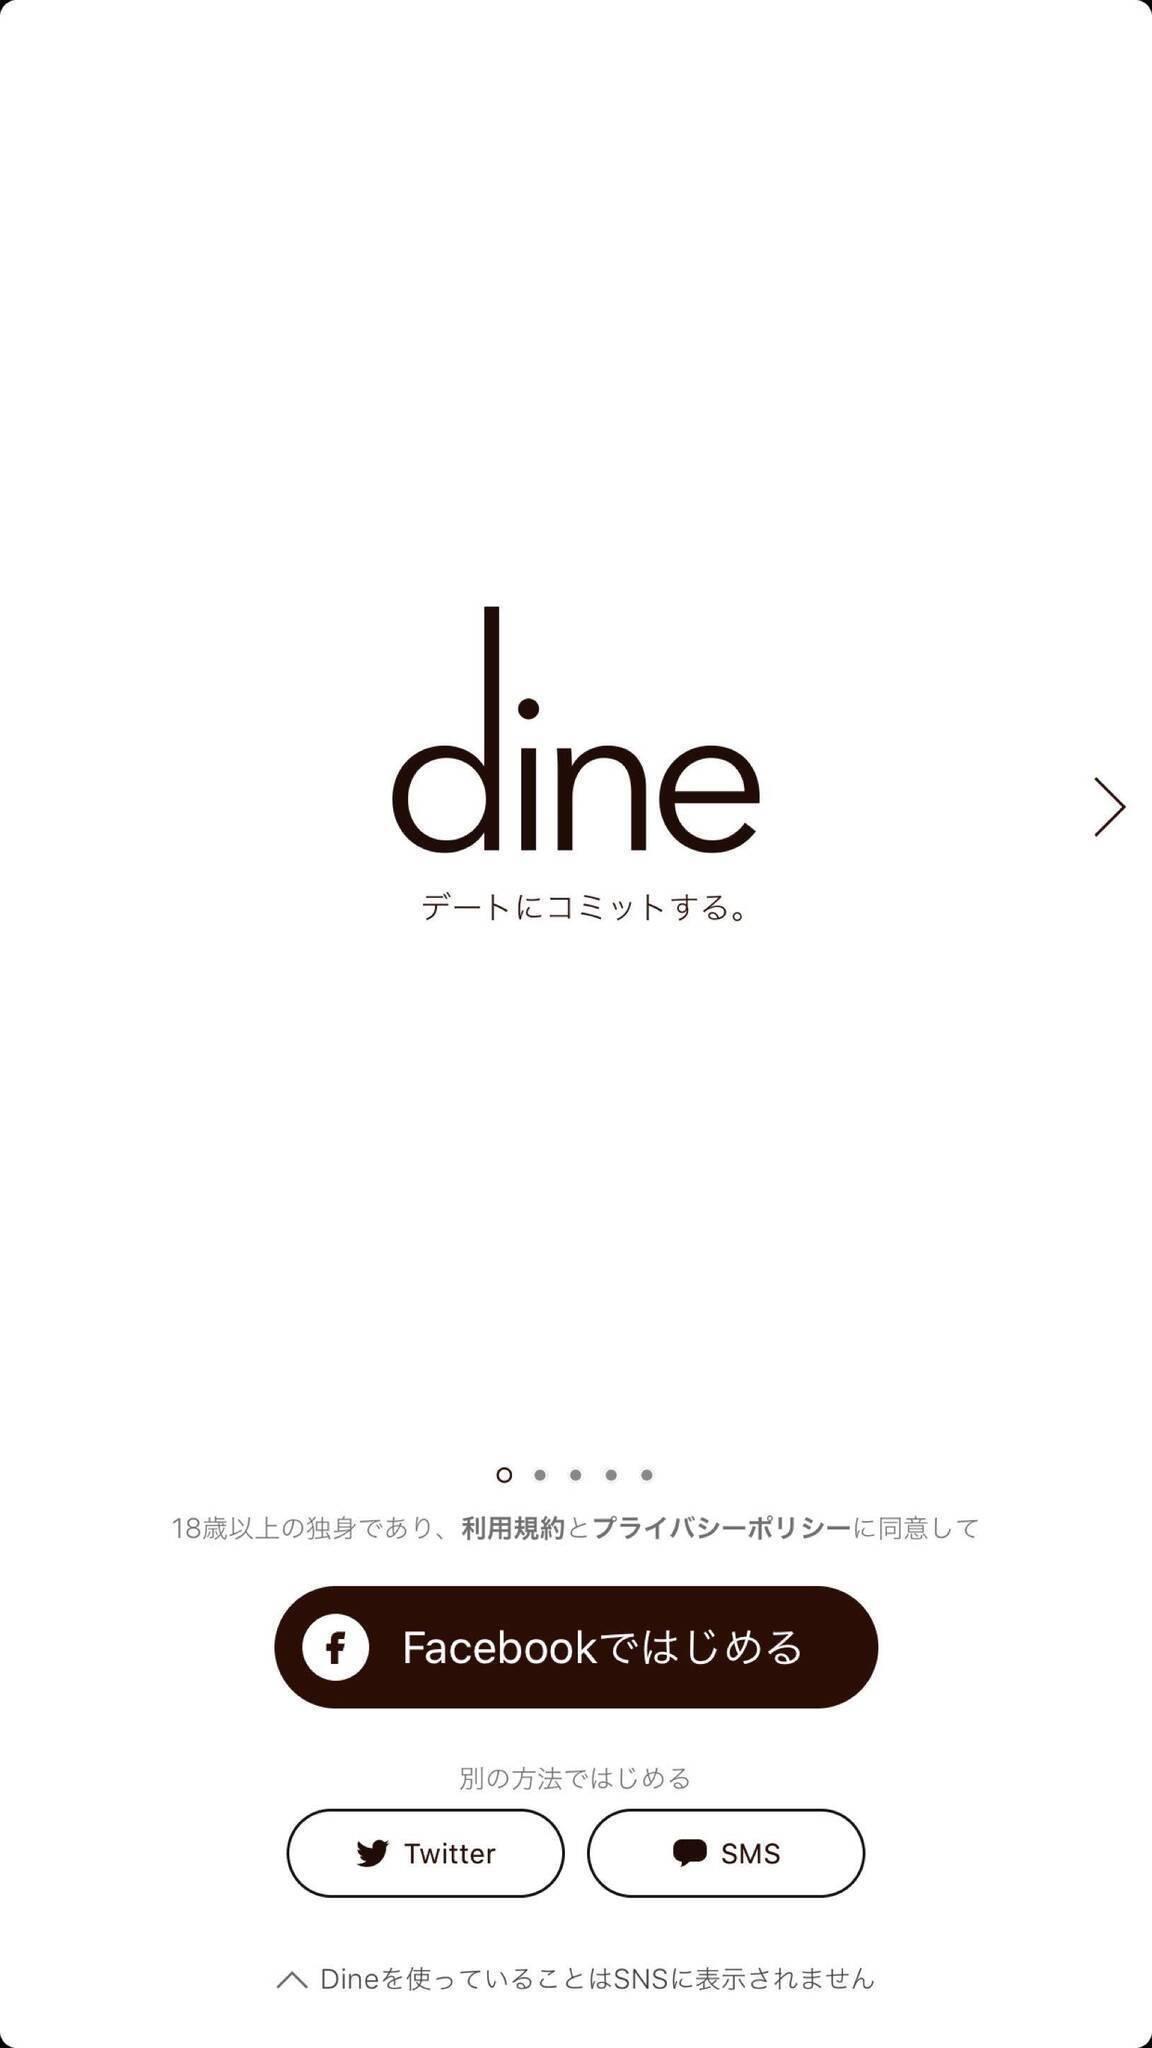 dine(ダイン) Dine(ダイン)の再登録方法